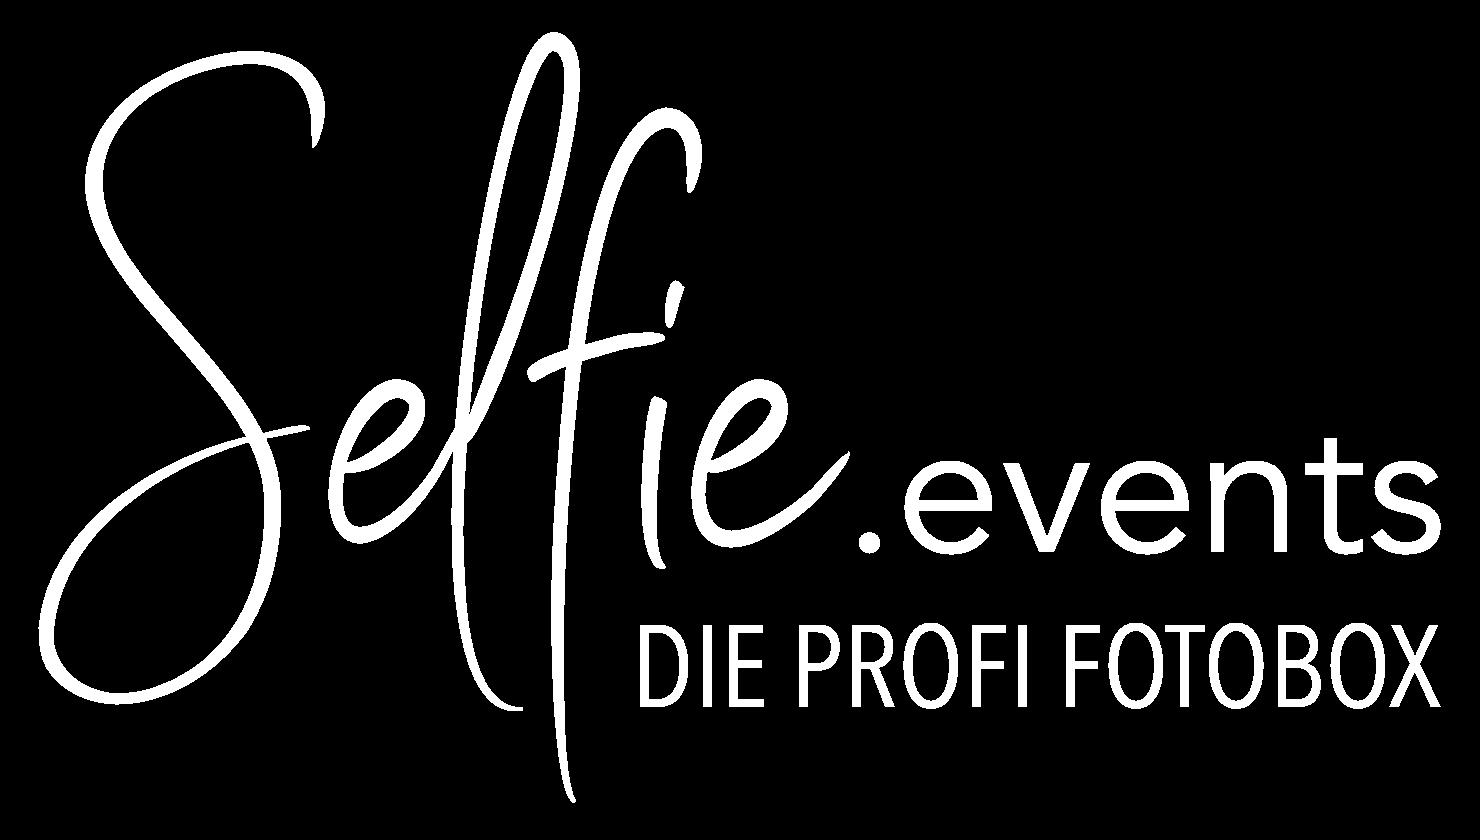 Selfie.events Fotobox Logo